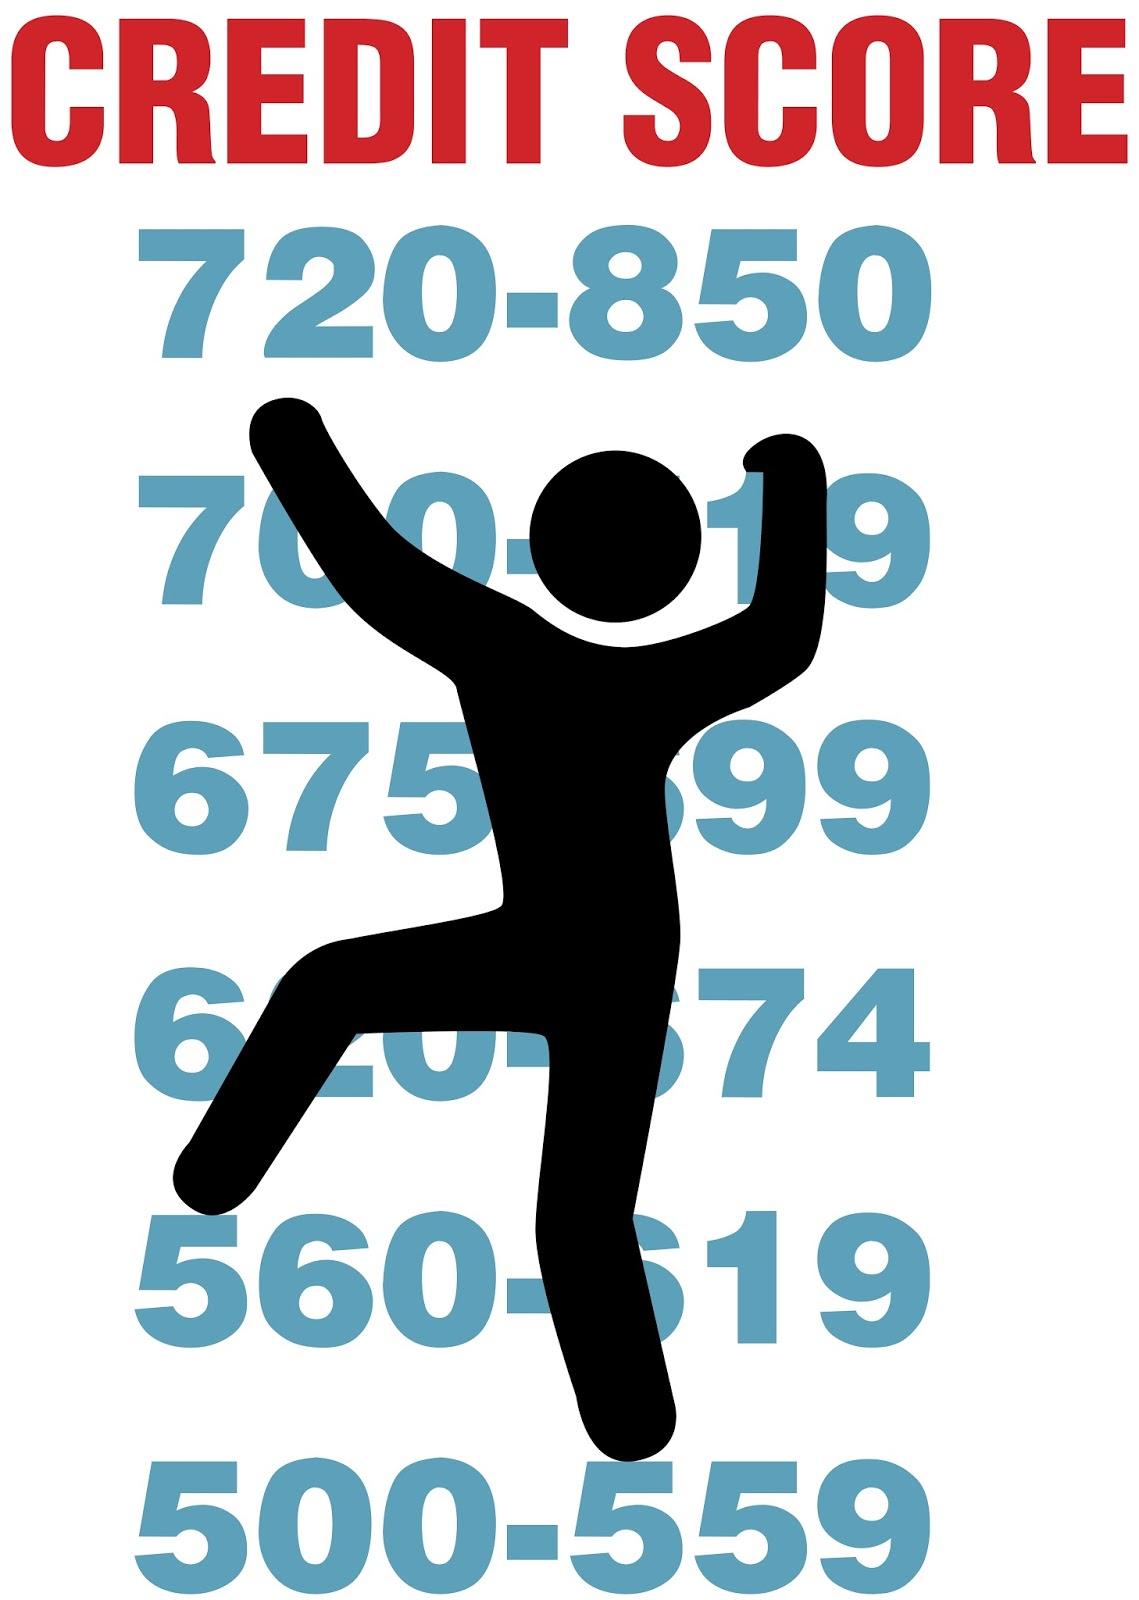 How To Do Cibil Score Calculation?